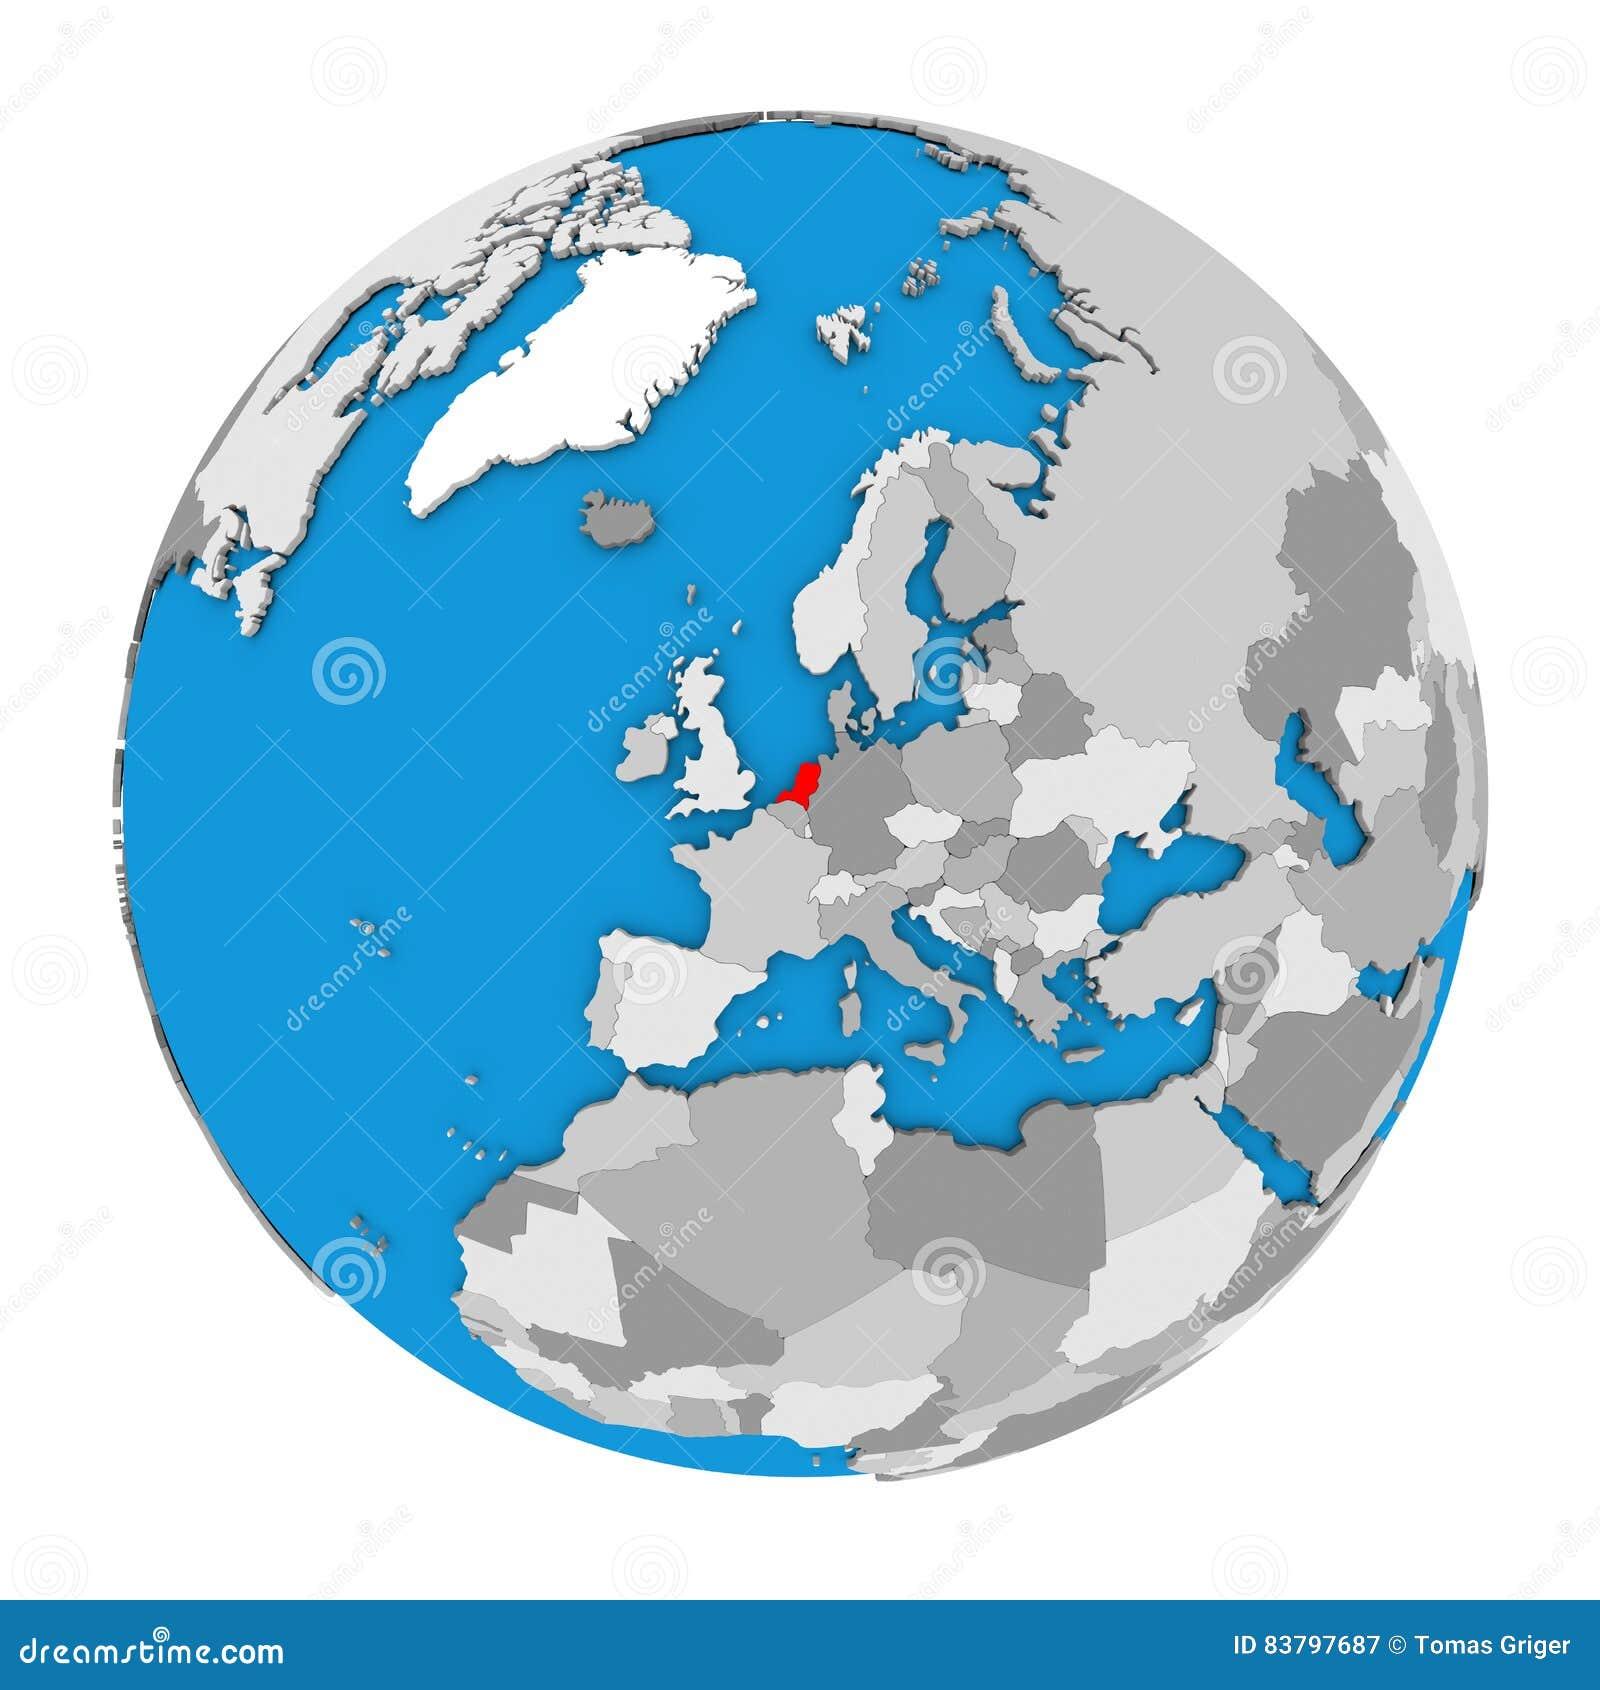 Netherlands on globe stock illustration. Illustration of political ...